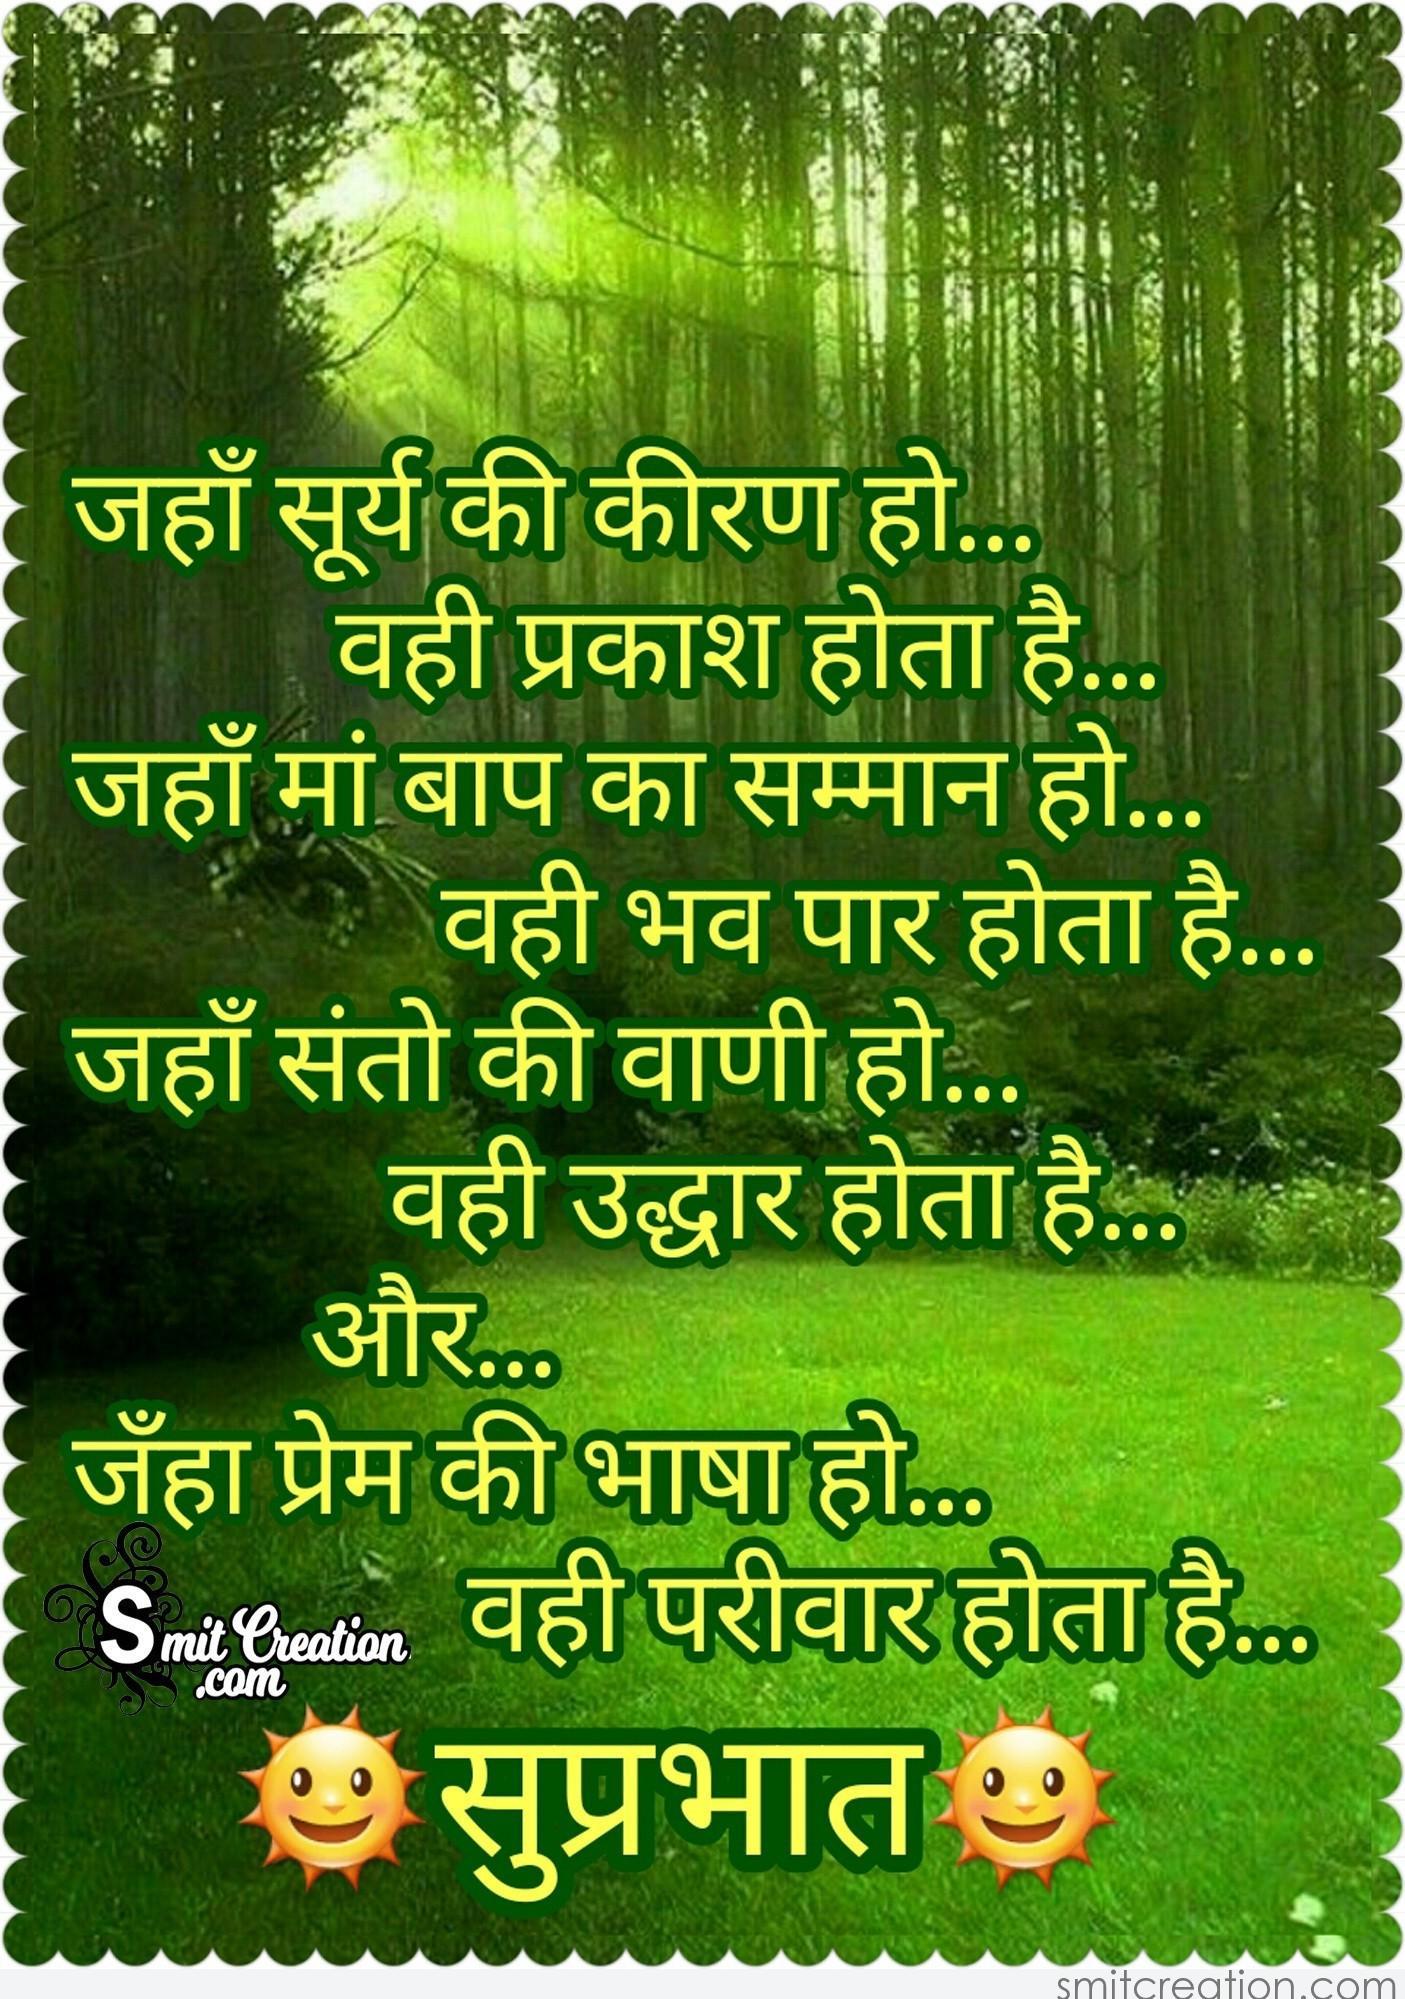 Suprabhat Suvichar Pictures and Graphics - SmitCreation.com